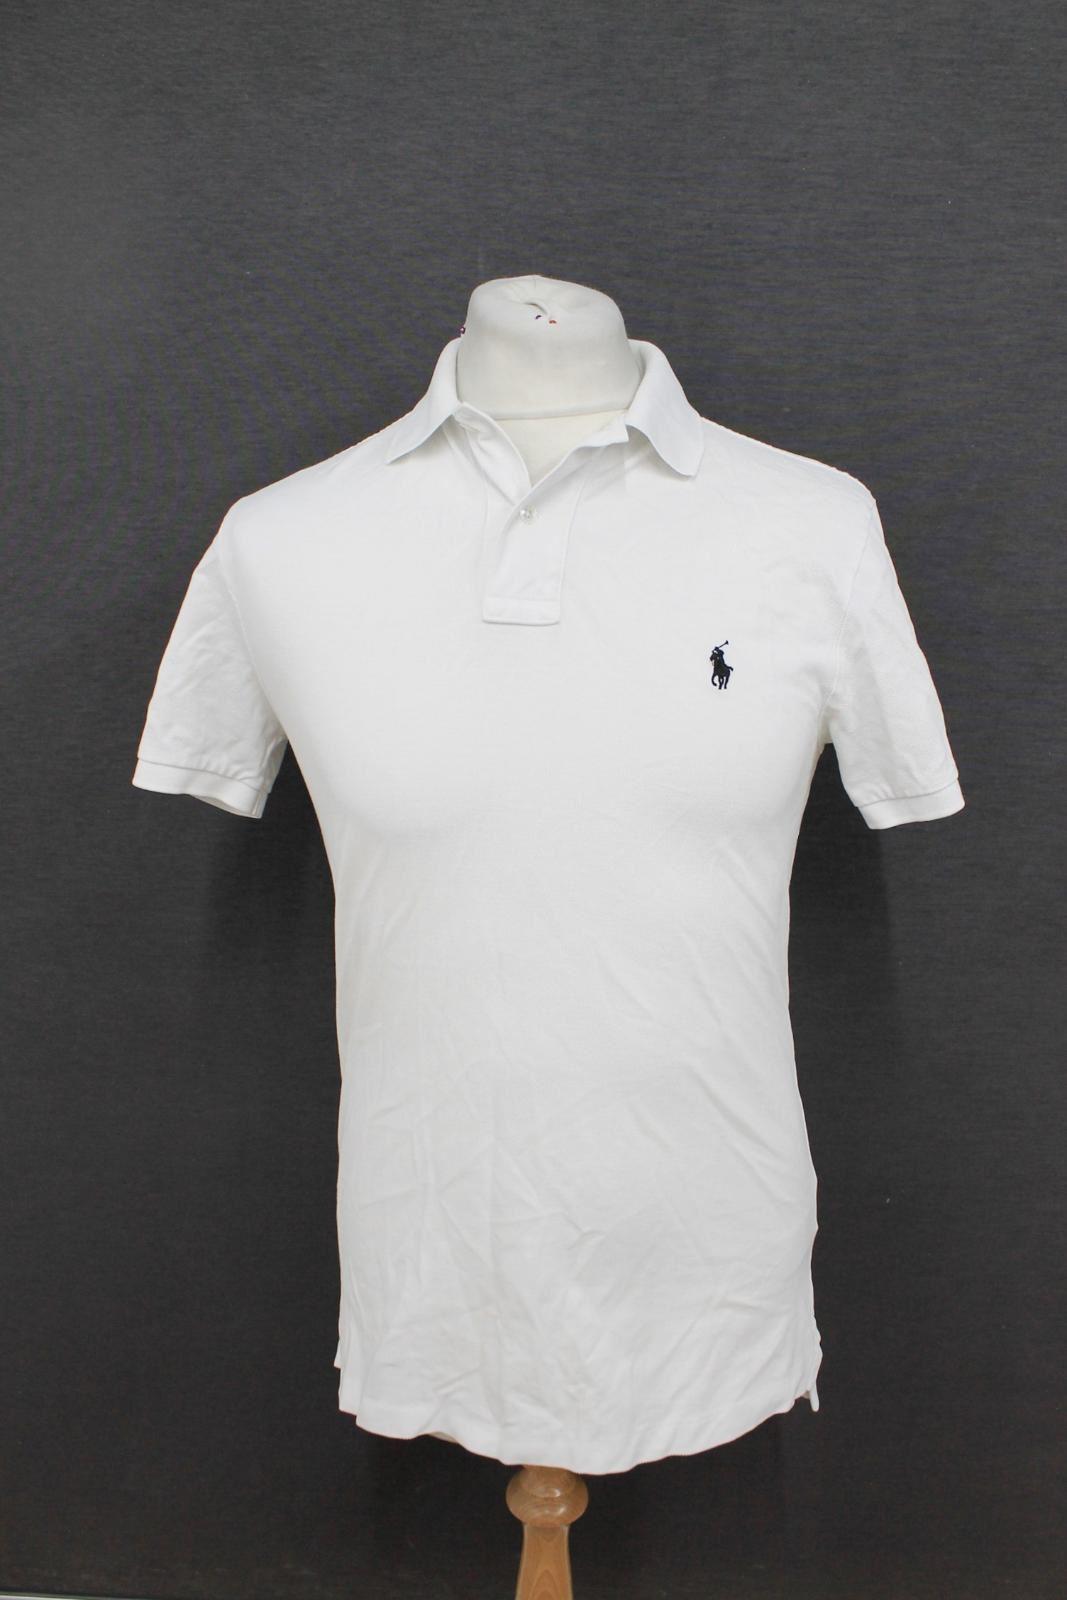 POLO by RALPH LAUREN uomo bianco a maniche corte Stretch slim fit polo shirt M